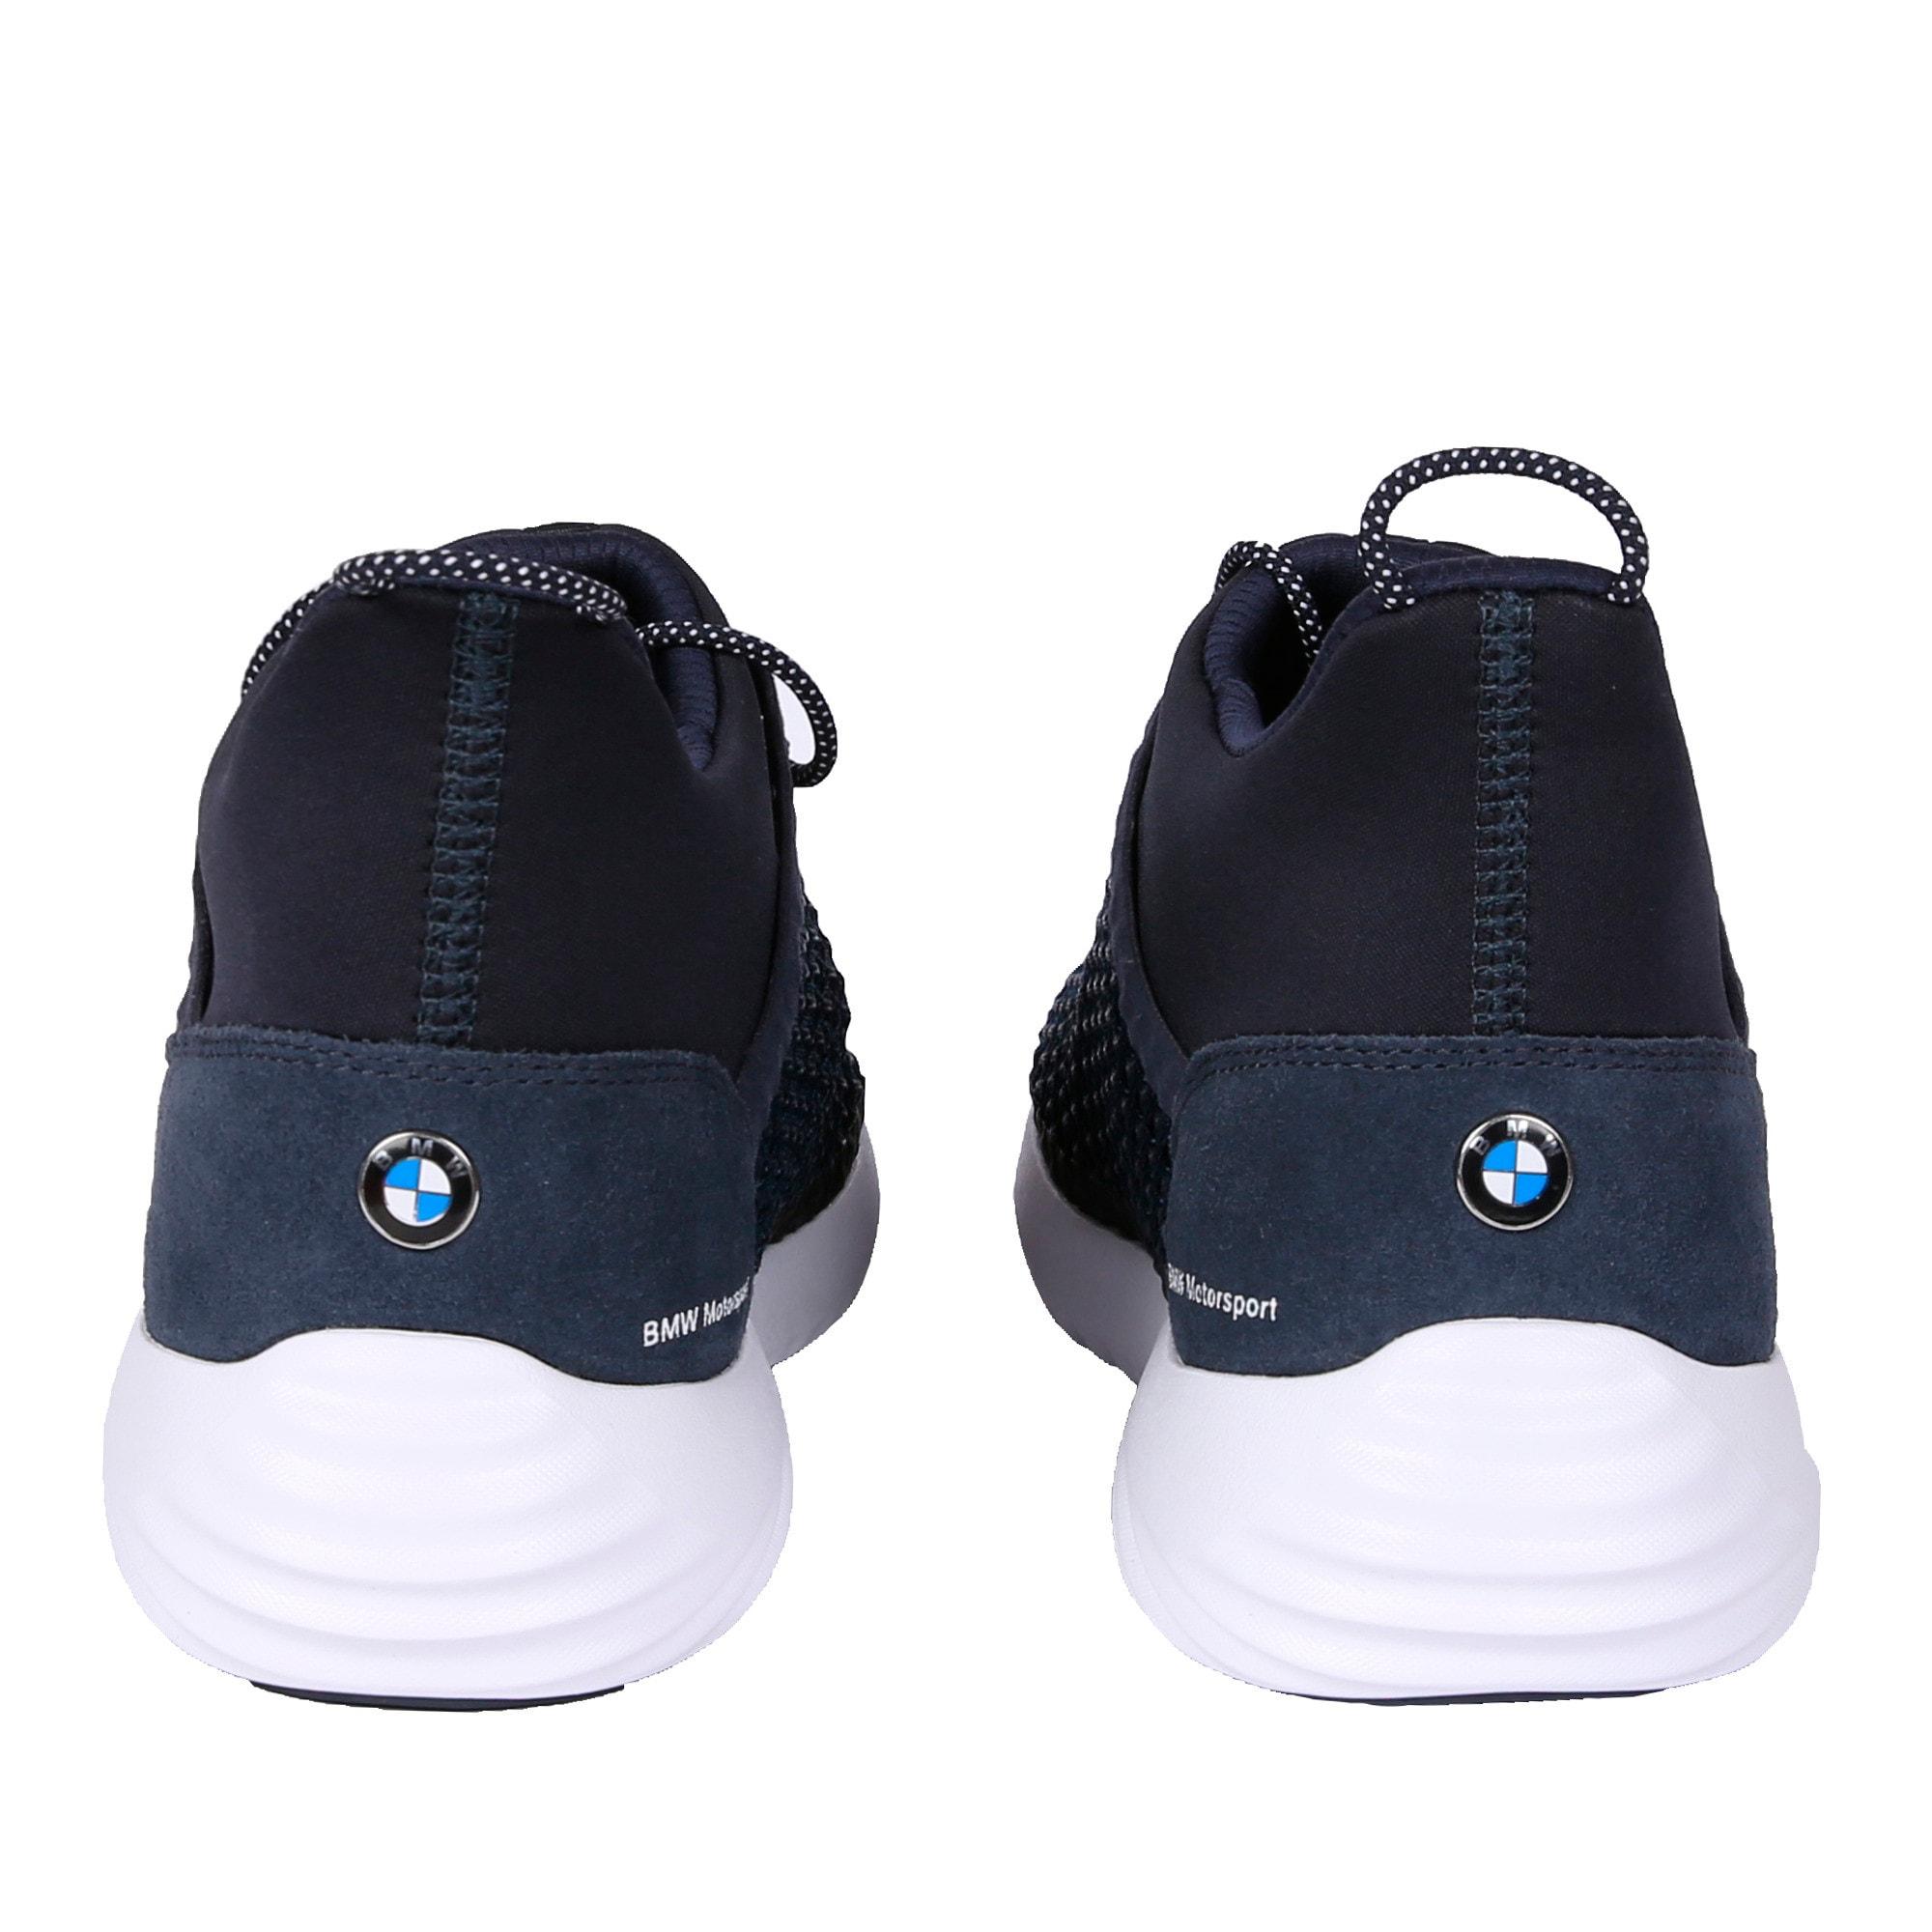 Thumbnail 3 of BMW Motorsport Speed Cat netFIT Blue Trainers, Team Blue-Team Blue-Puma Wht, medium-IND